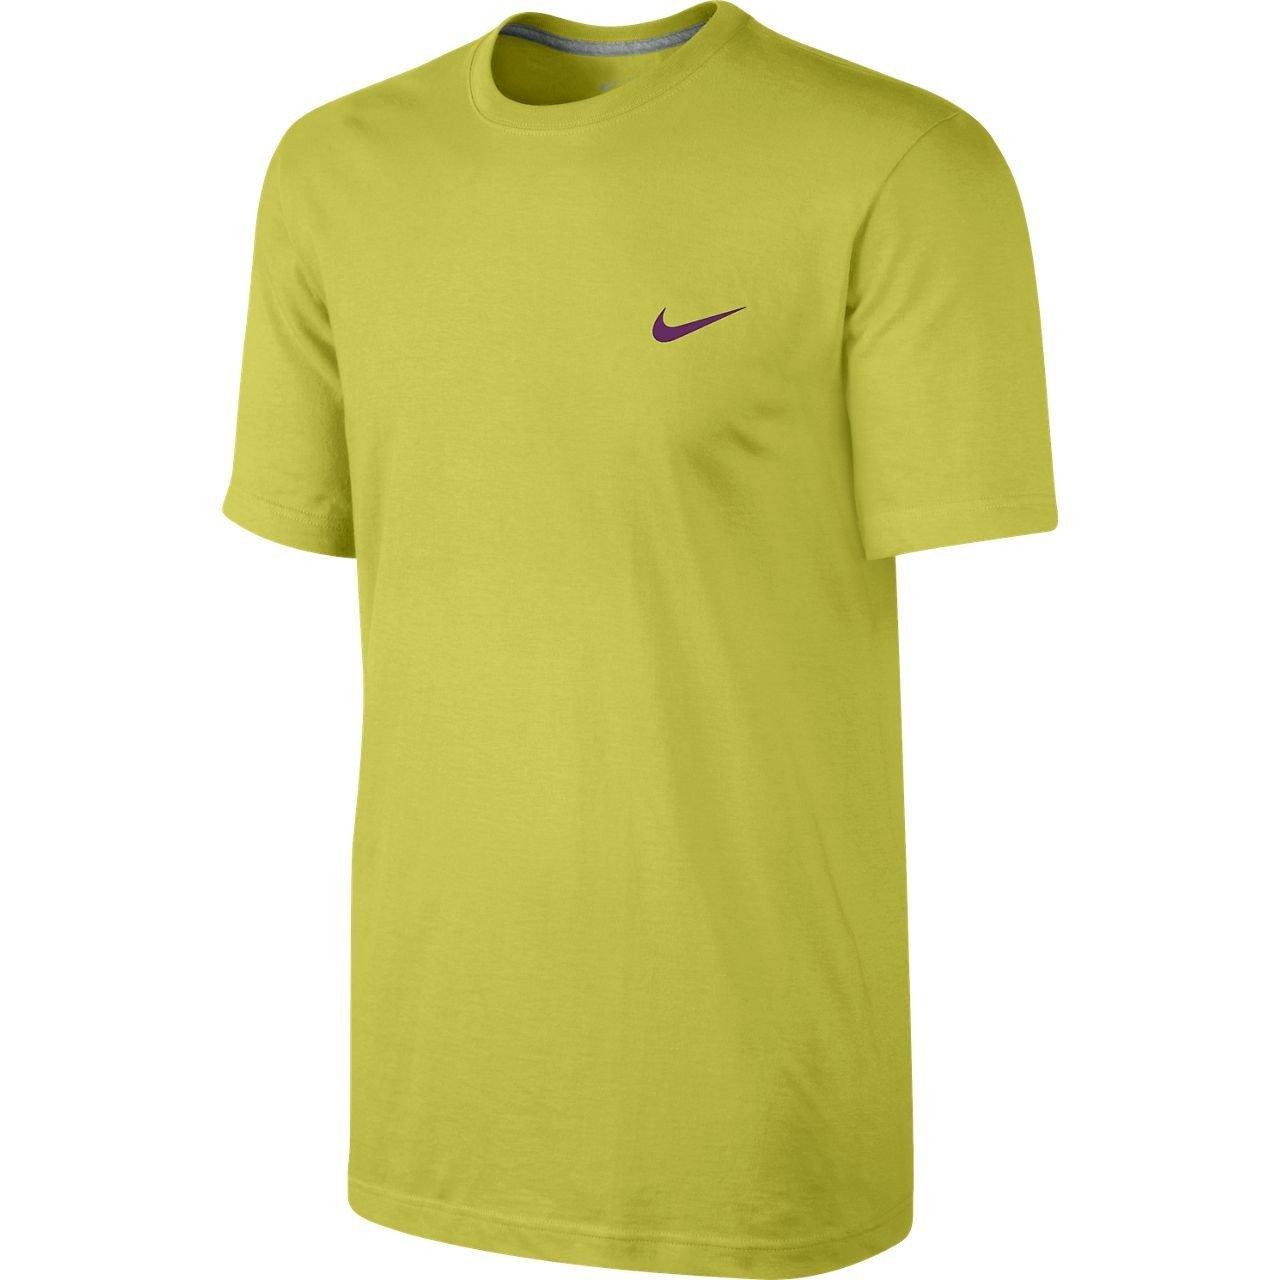 Nike Tennissocken Dri-fit Half Cushion Quarter 3er Pack Calcetines, Unisex Adulto: Amazon.es: Ropa y accesorios